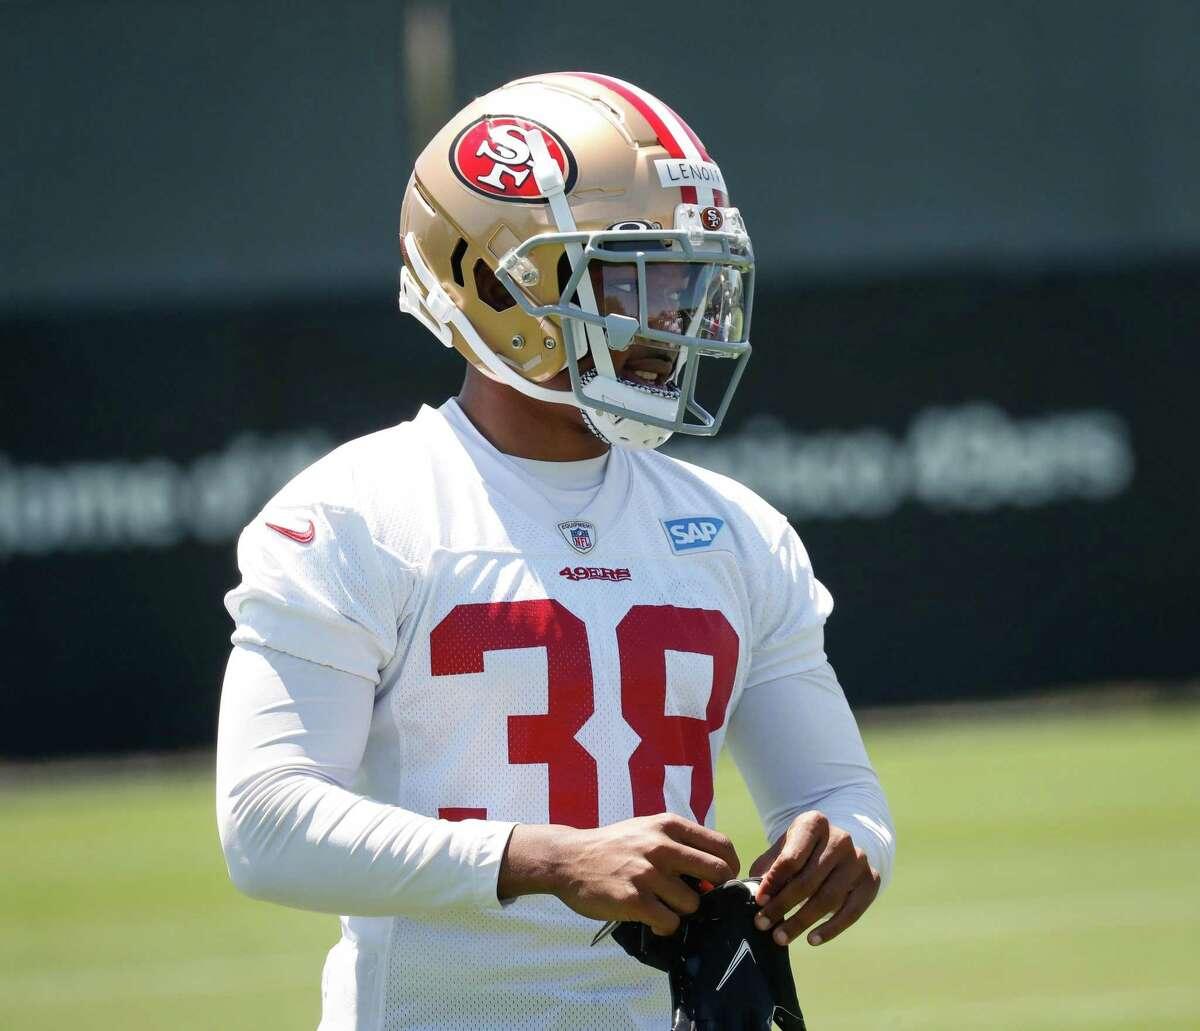 49ers cornerback Demmodore Lenoir (38) practices at 49ers headquarters on Wednesday, June 2, 2021 in Santa Clara, Calif.